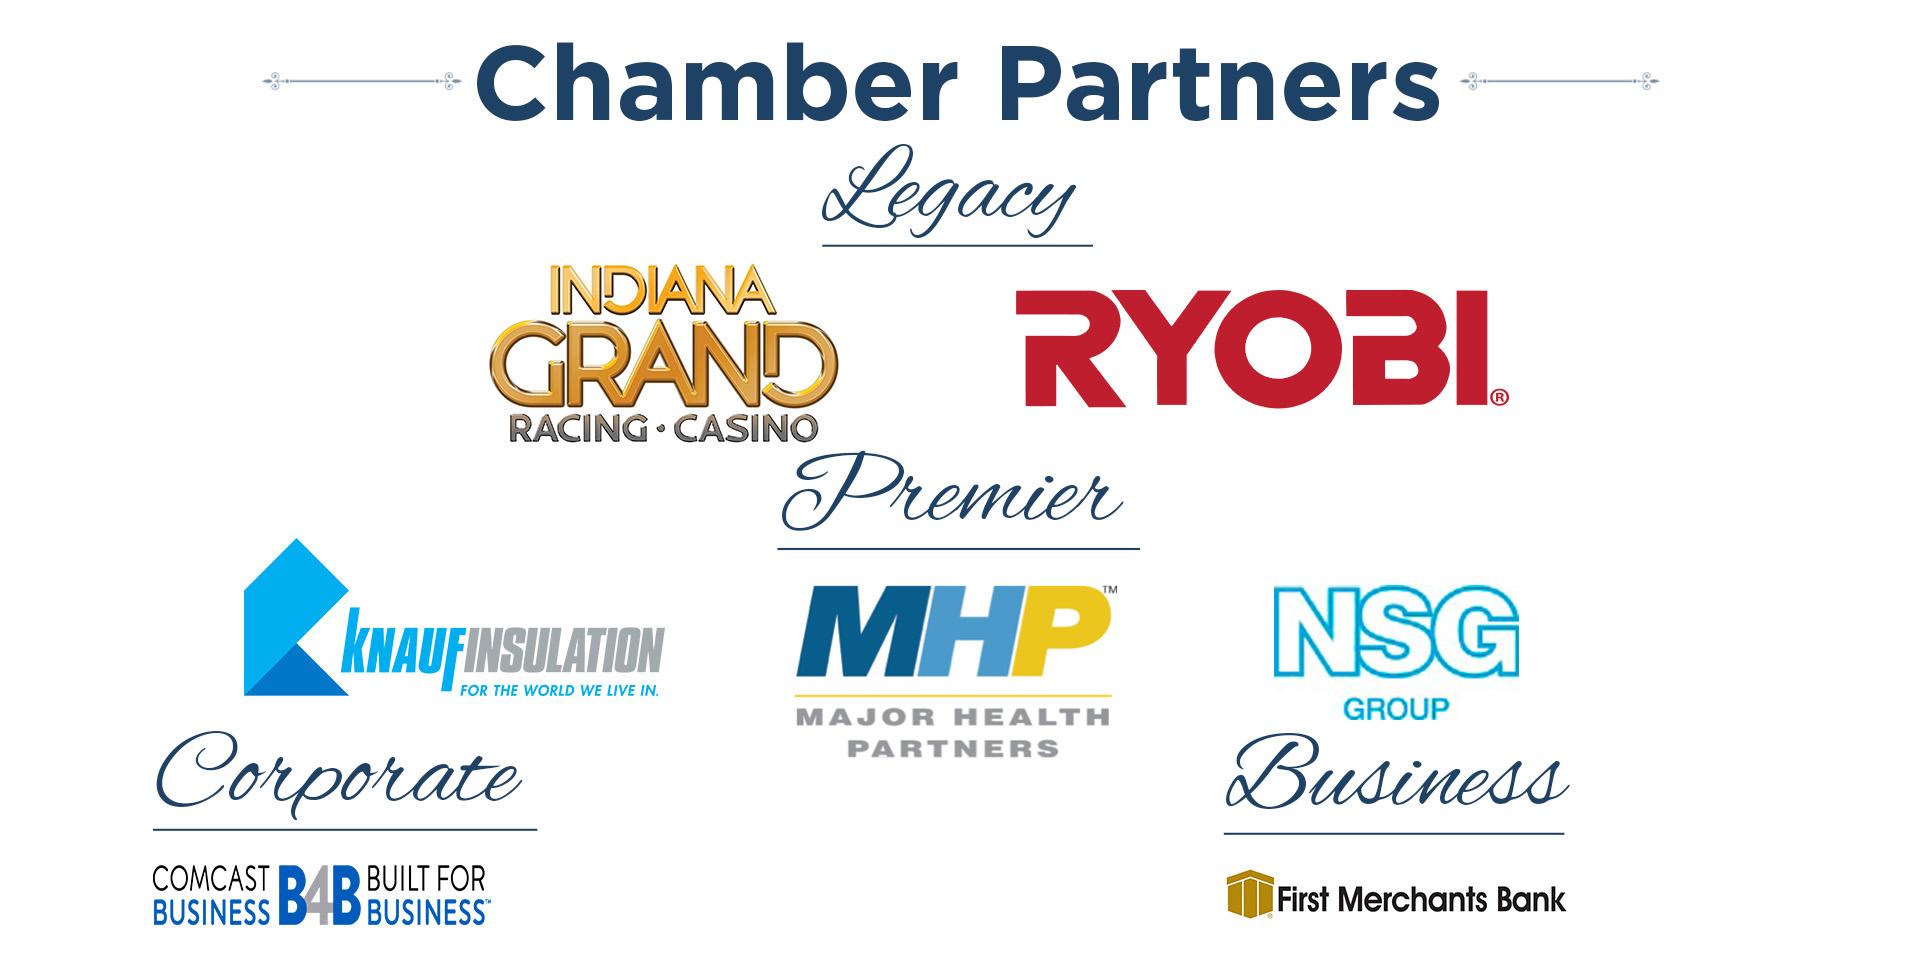 BG2-ChamberPartnersCollage.jpg